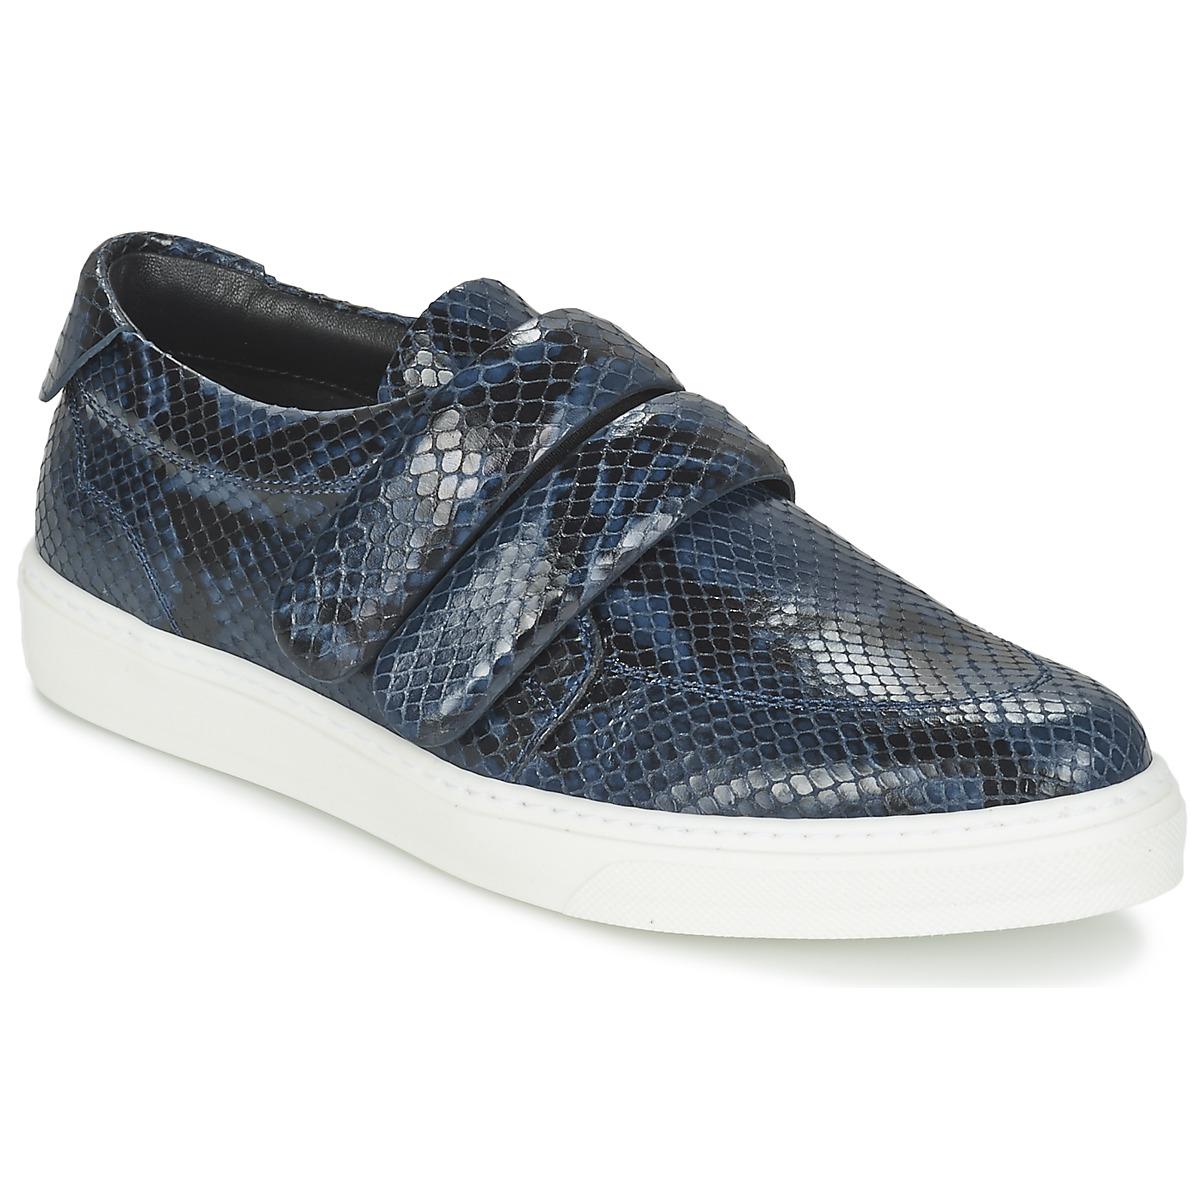 Sonia Rykiel SPENDI Blau / Schwarz - Kostenloser Versand bei Spartoode ! - Schuhe Sneaker Low Damen 164,50 €